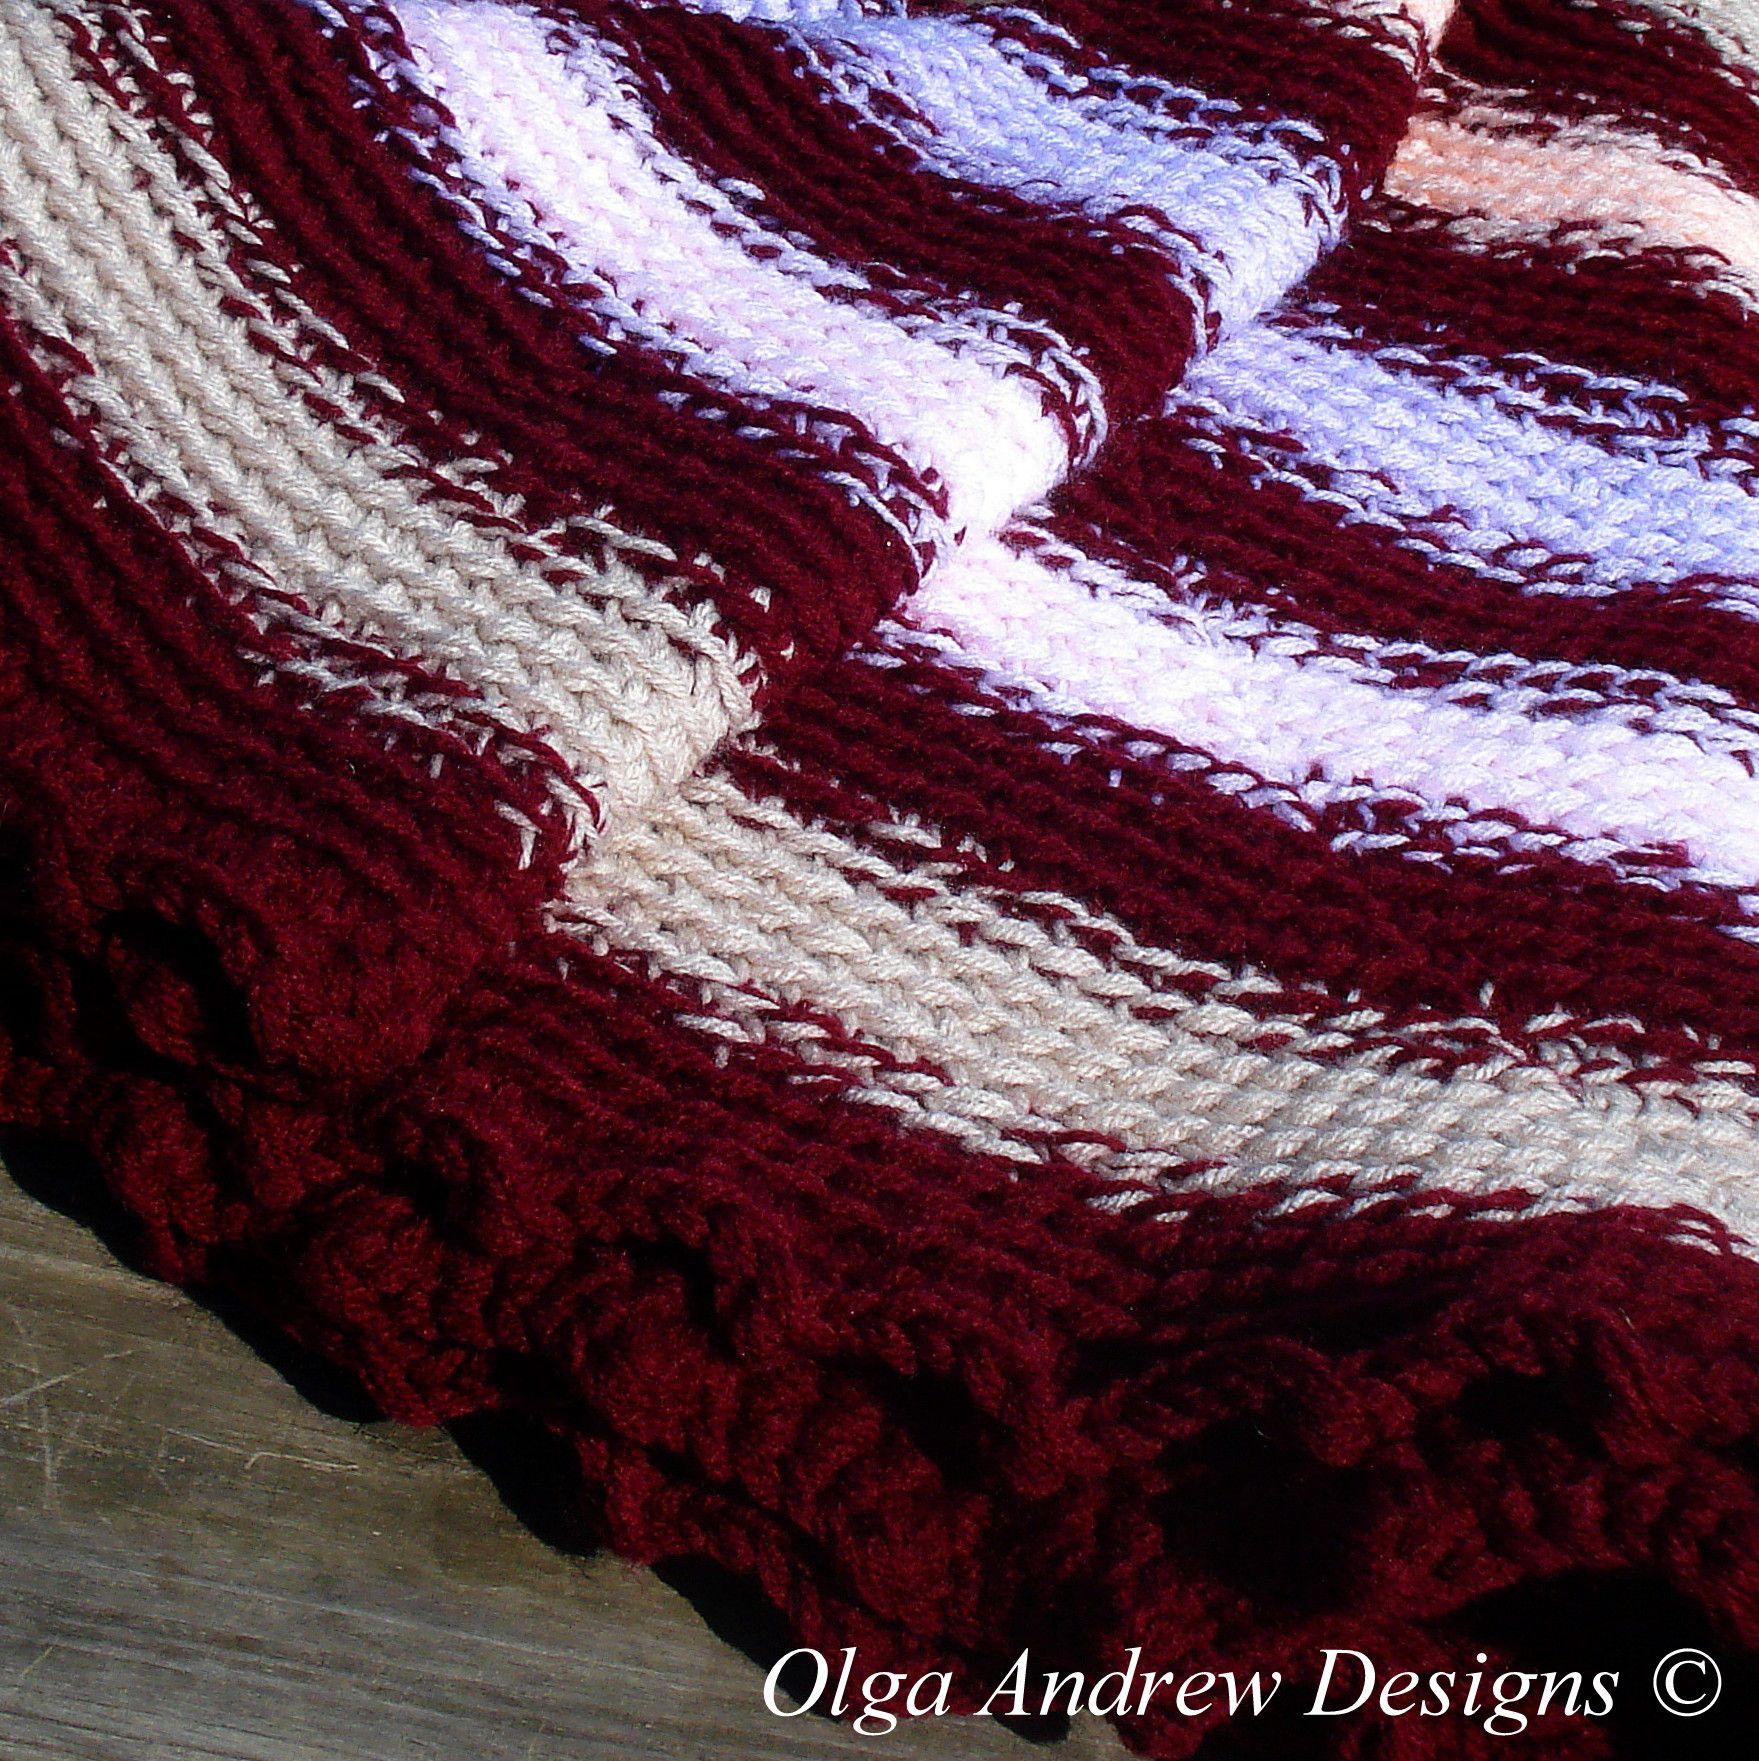 Round crochet blanket crochet round shawl crochet round wrap round crochet blanket crochet round shawl crochet round wrap crochet blanket crochet round blanket crocheted blanket olgaandrewdesigns bankloansurffo Images